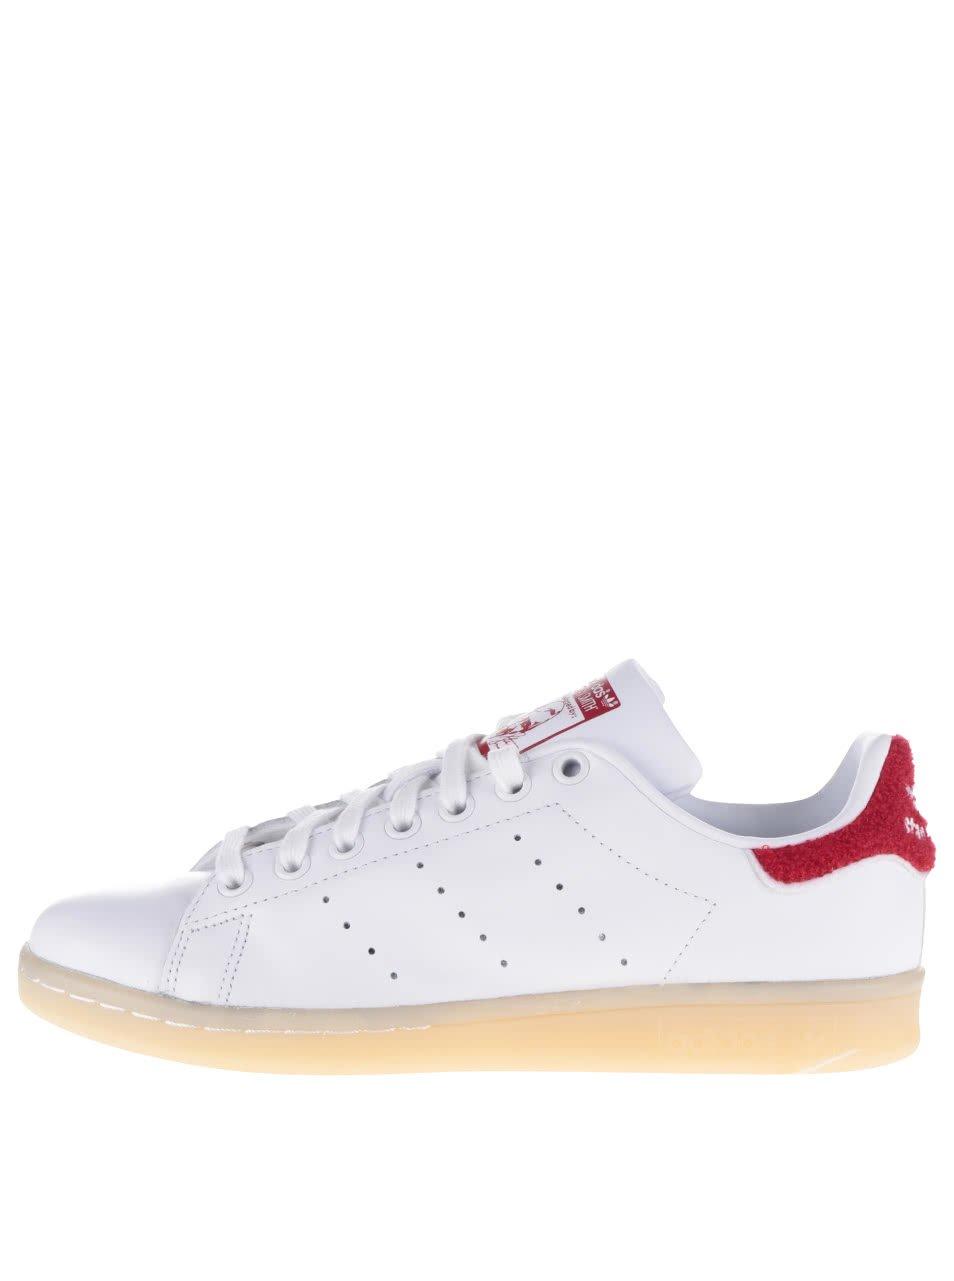 Červeno-bílé dámské tenisky adidas Originals Stan Smith